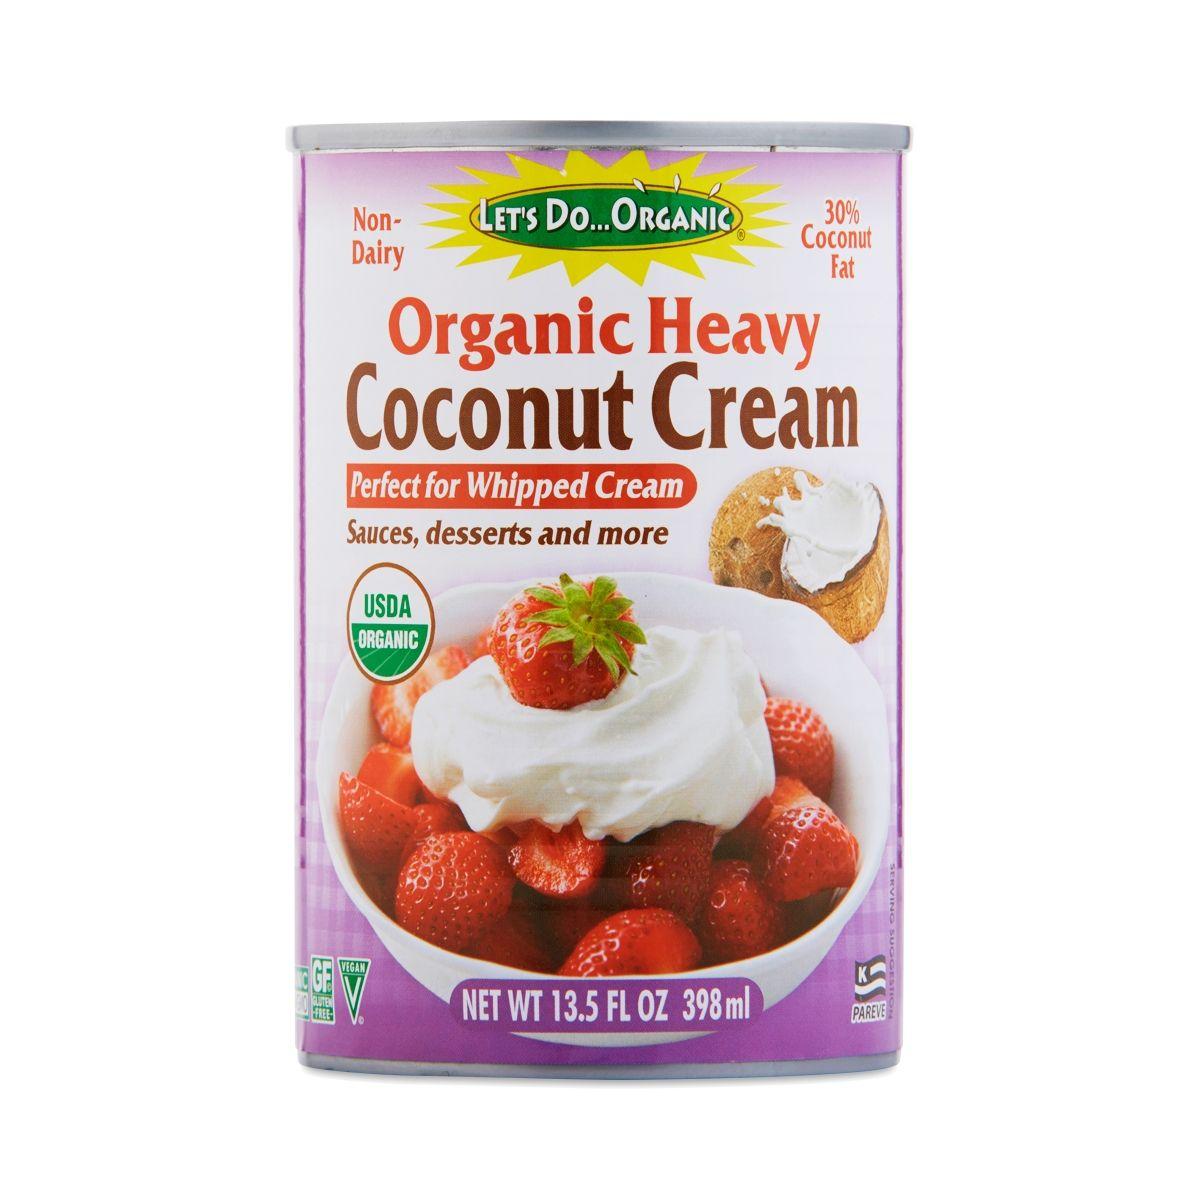 Let S Do Organic Organic Heavy Coconut Cream Organic Coconut Cream Coconut Cream Benefits Of Organic Food